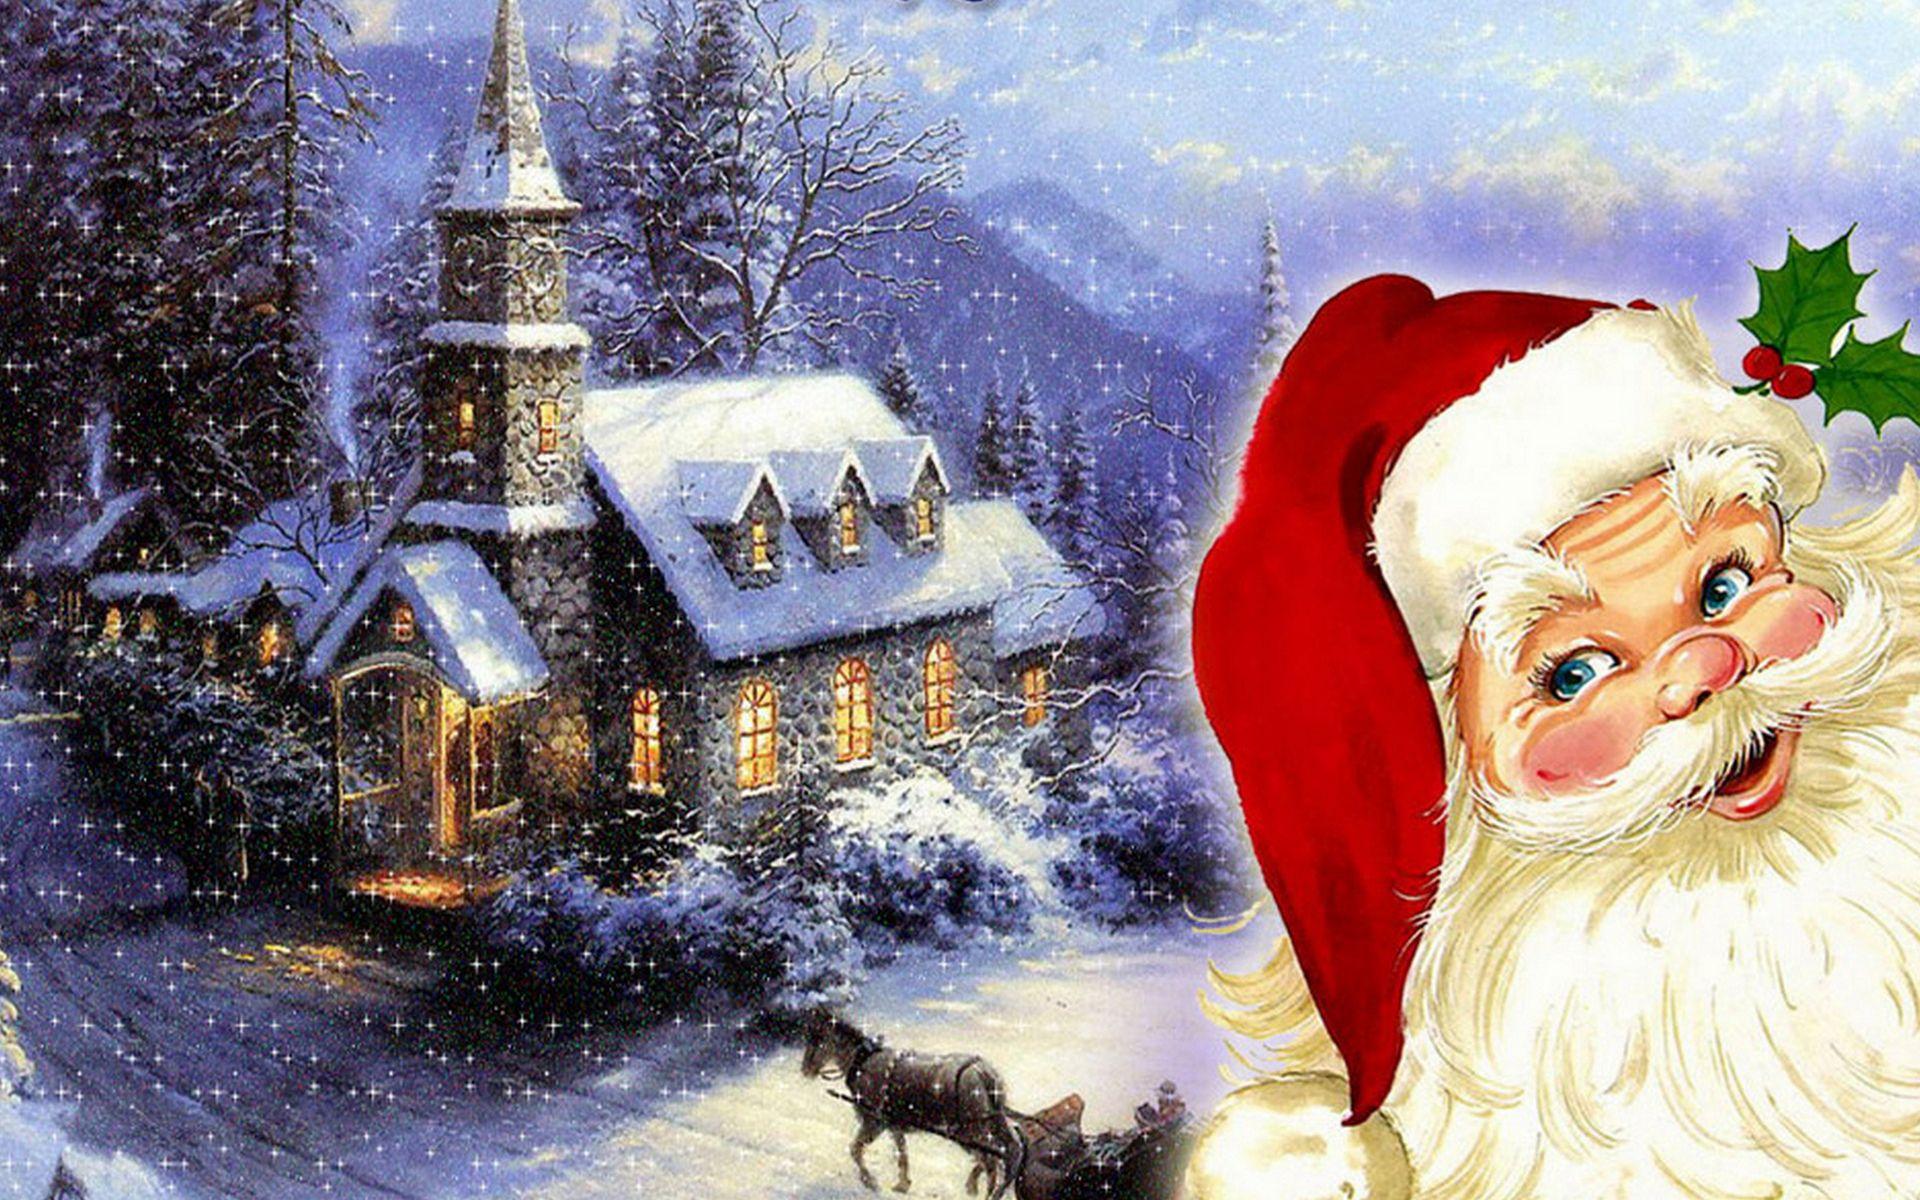 Merry Christmas Santa Claus Merry Christmas To Santa Claus Hd 2013 Wallpaper Cat Marry Christmas Wallpaper Merry Christmas Wallpaper Christmas Wallpaper Free